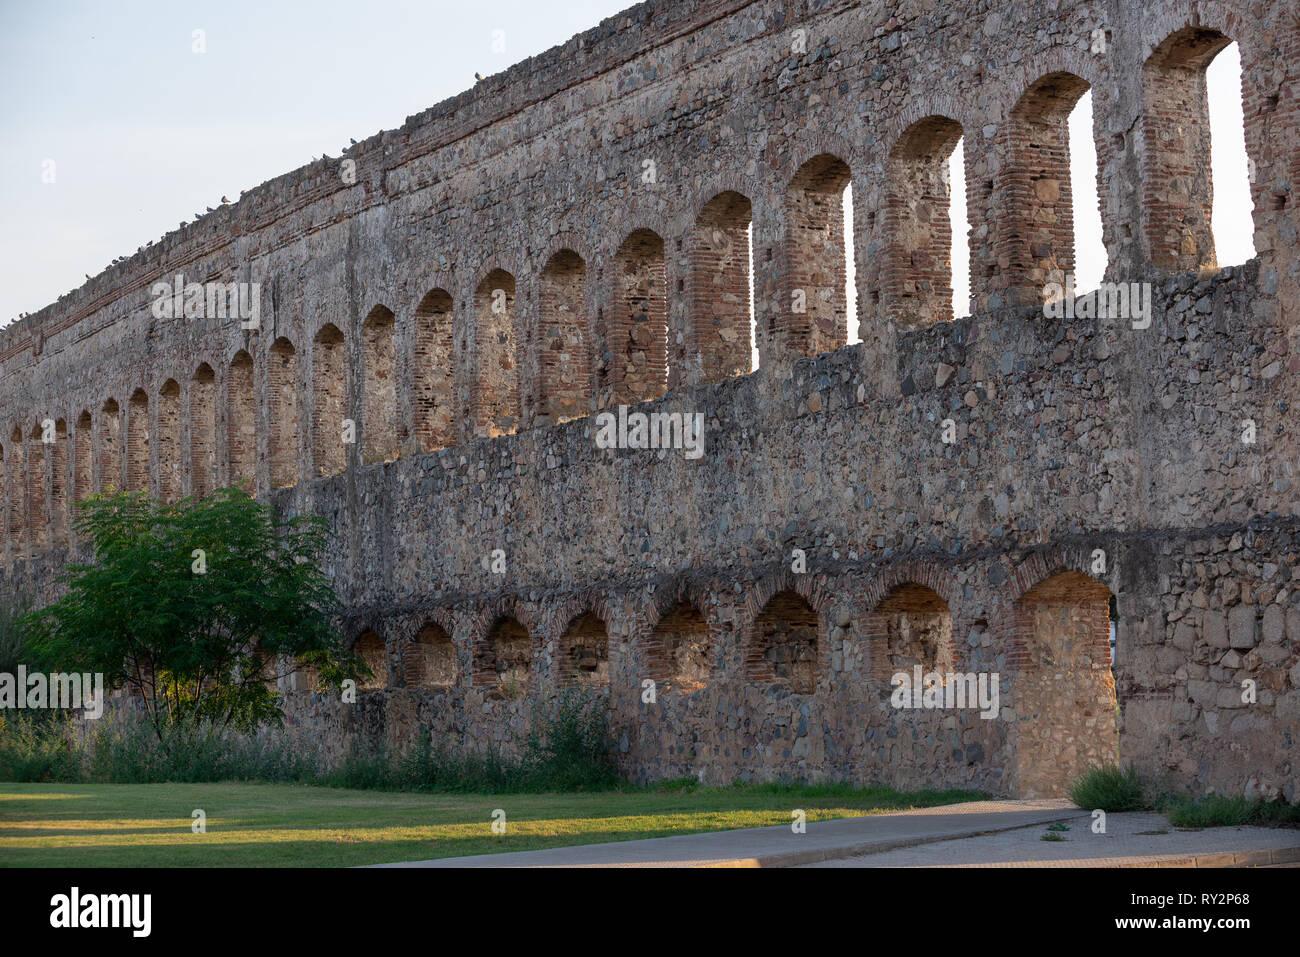 Acueducto San Lazaro in Merida Badajoz aqueduct at Extremadura of Spain - Stock Image